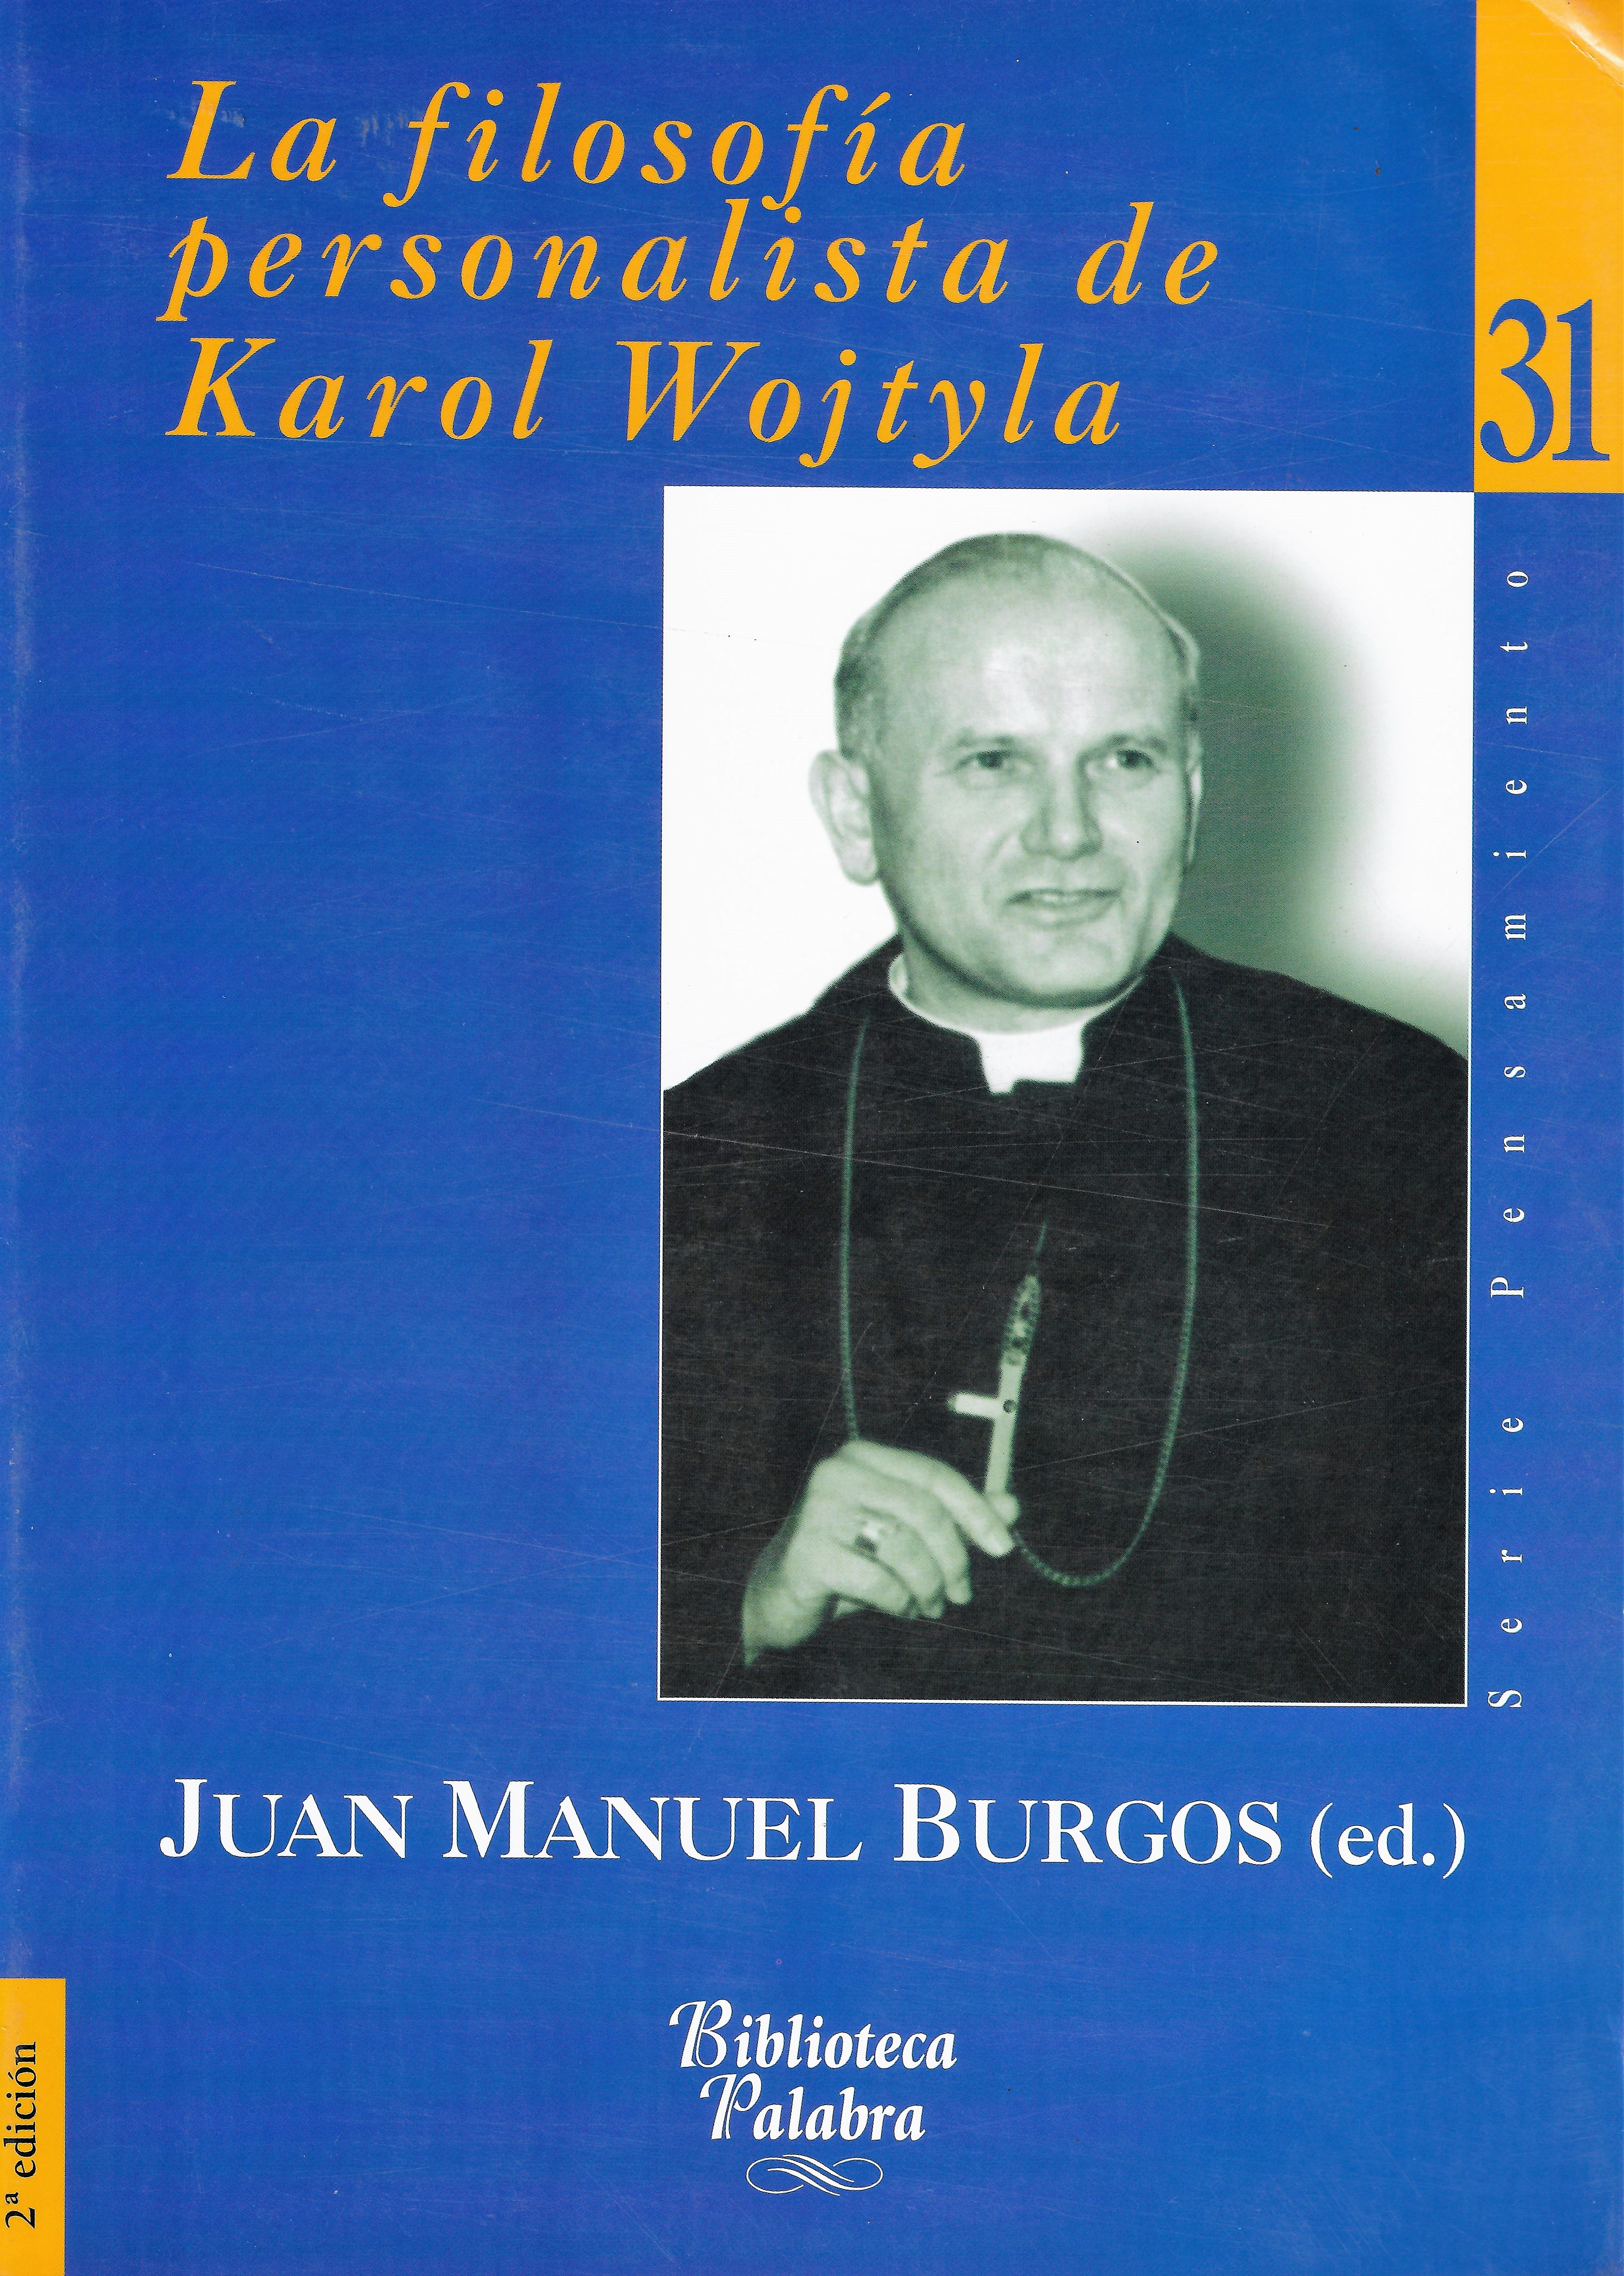 La Filosofía Personalista de Karol Wojtyla